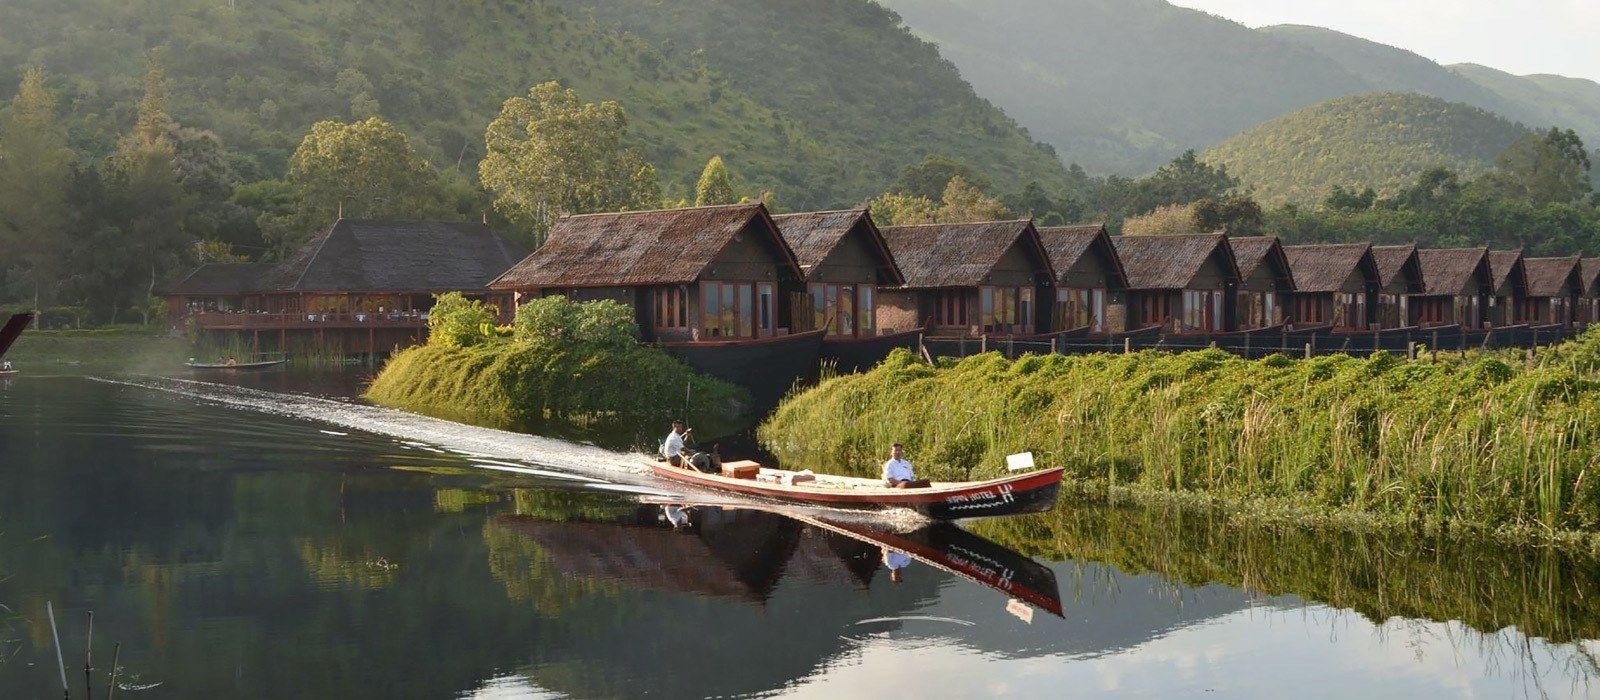 Hotel Pristine Lotus Spa Resort (Inle Lake) Myanmar